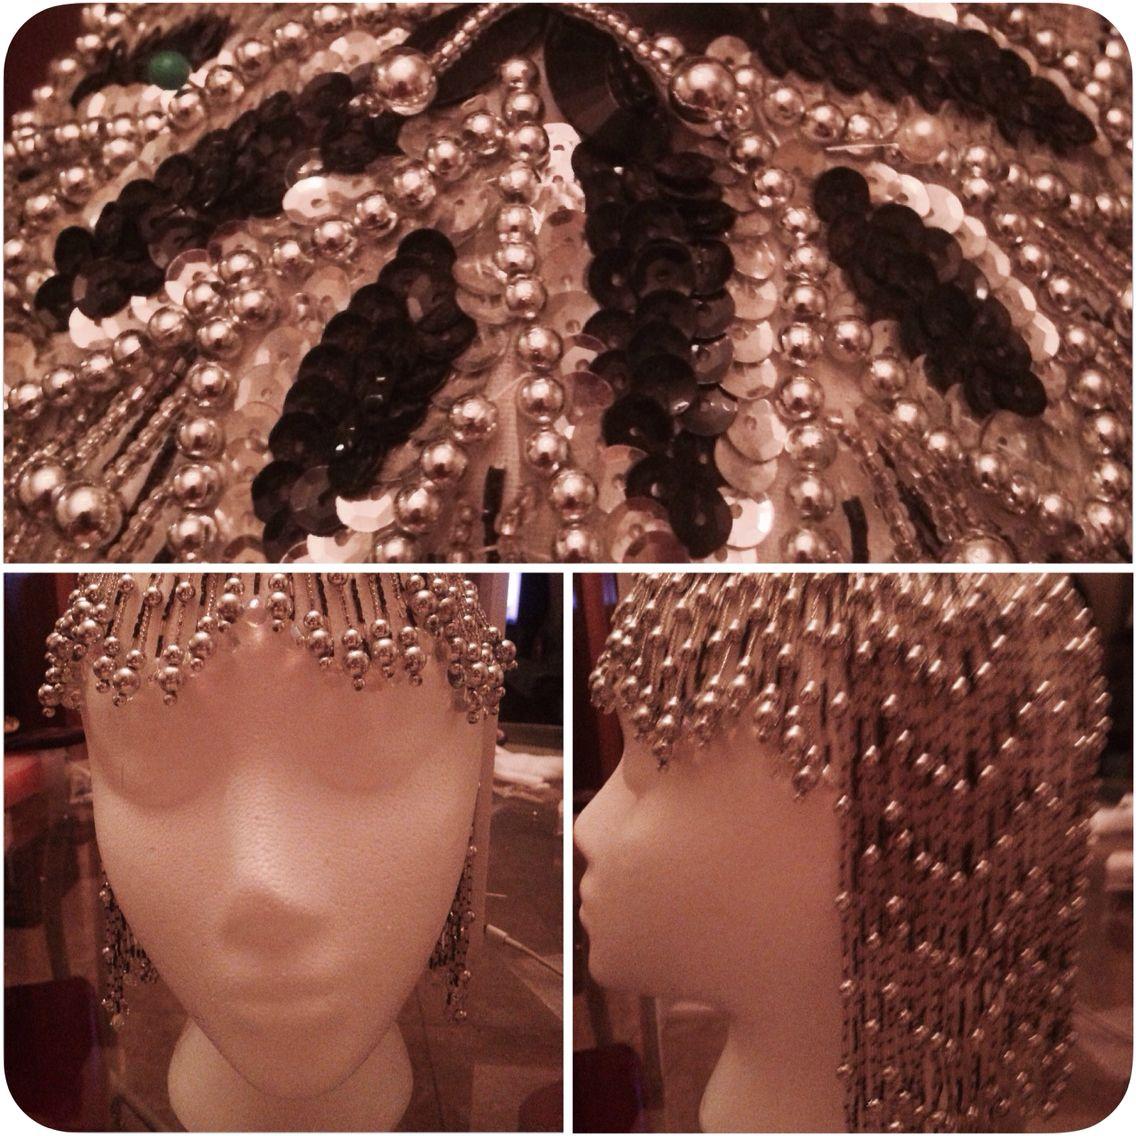 Black & Silver sequined & beaded headdress. $100.00 Joann Tavano